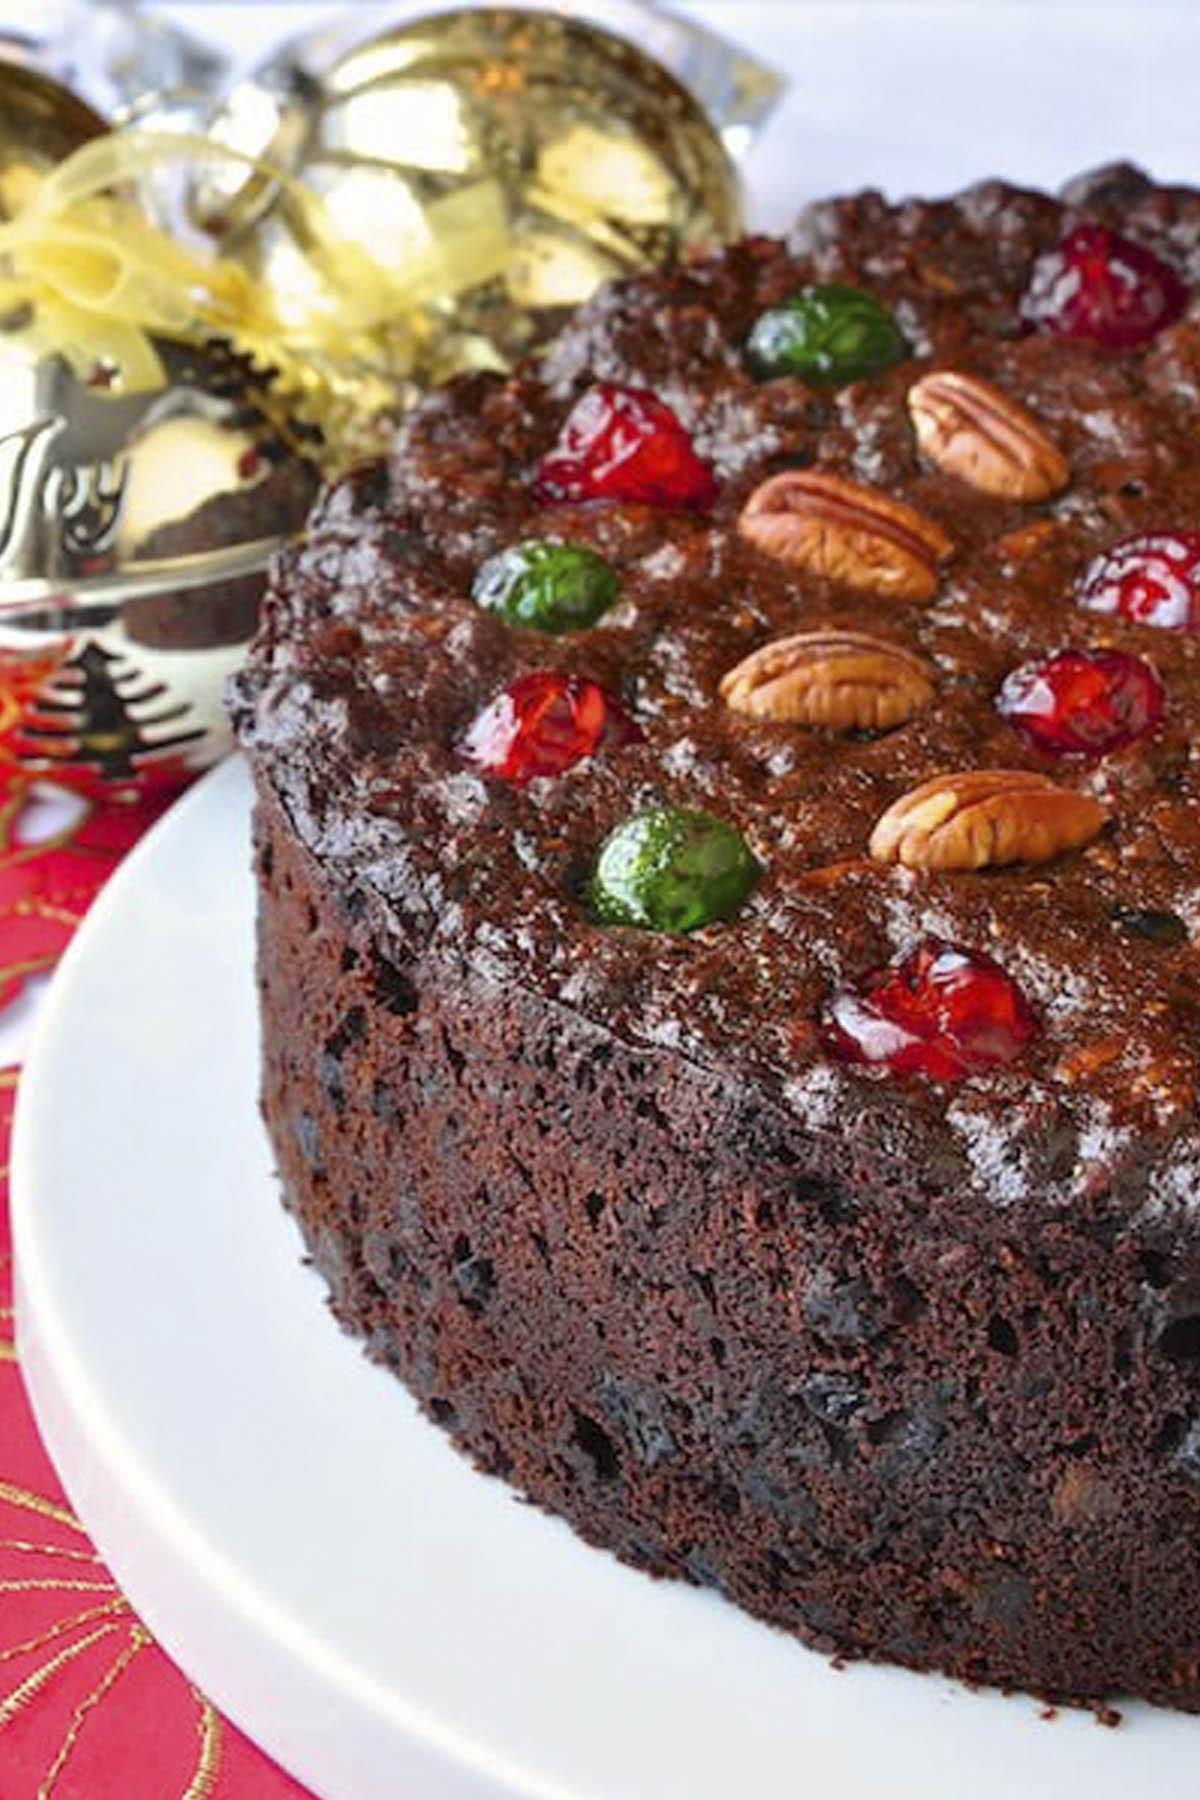 Best Fruitcake Recipe  13 Best Fruitcake Recipes How to Make Easy Fruitcake